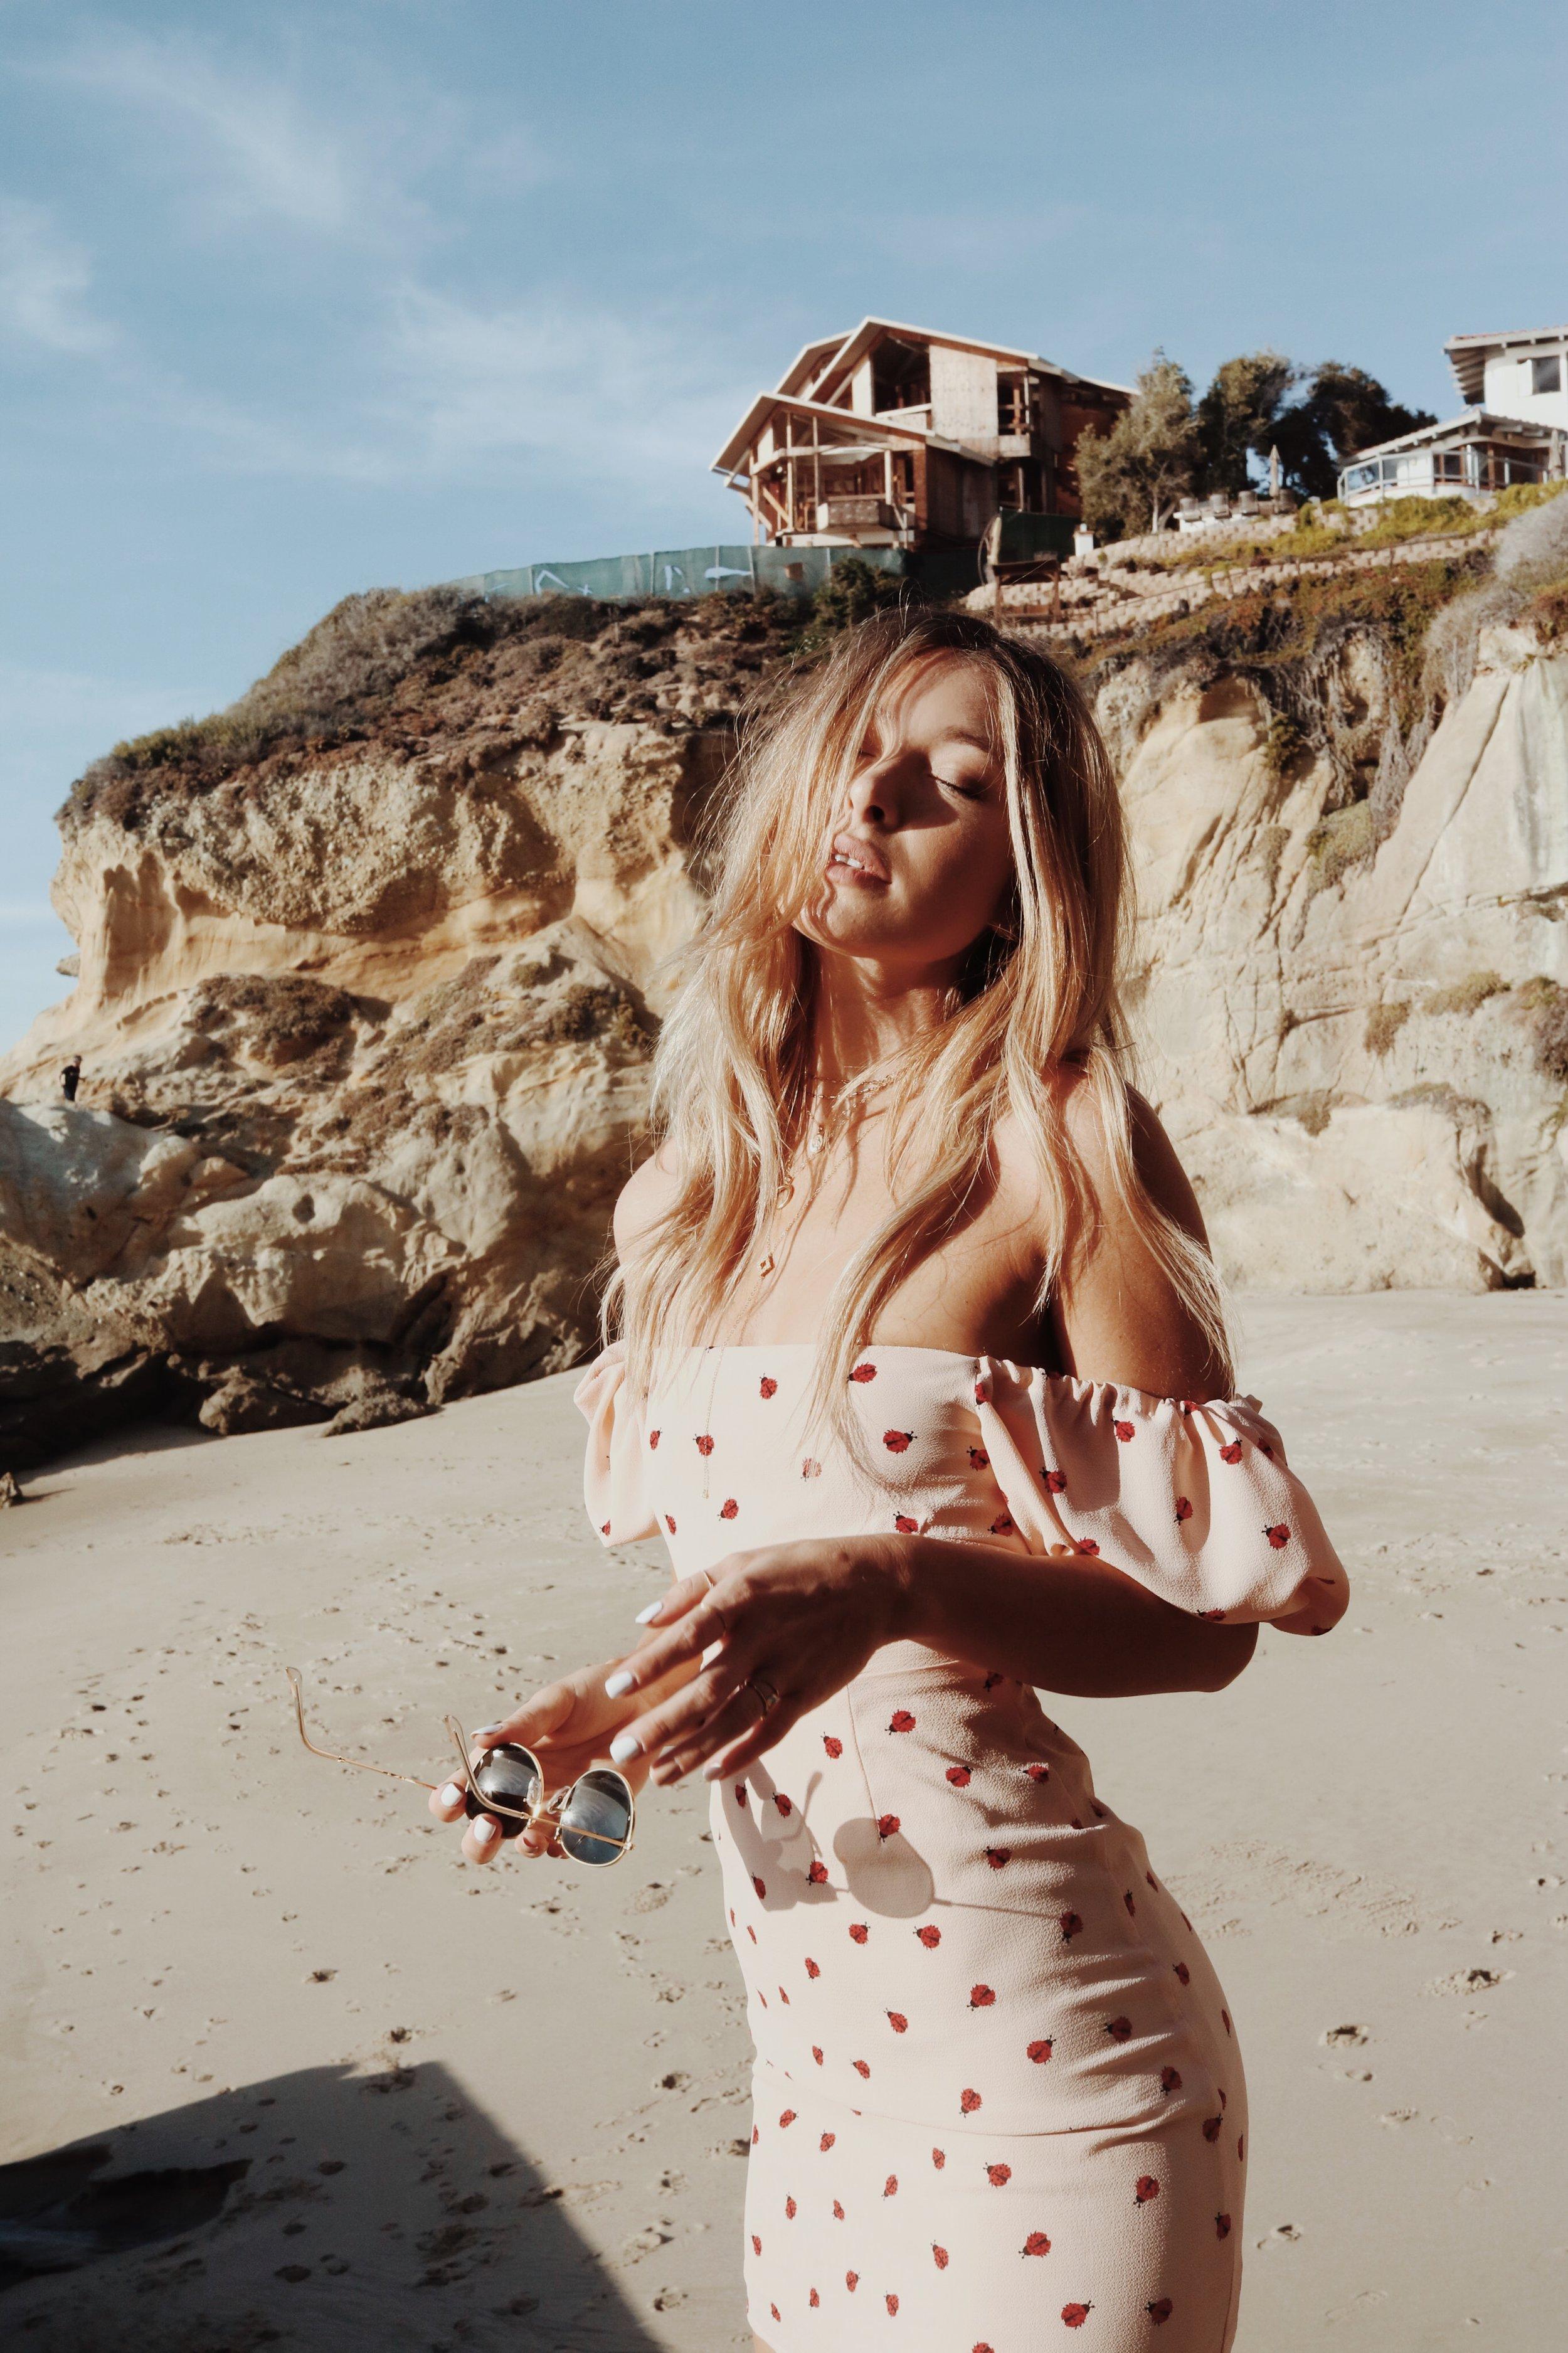 Dress by Endless Summer